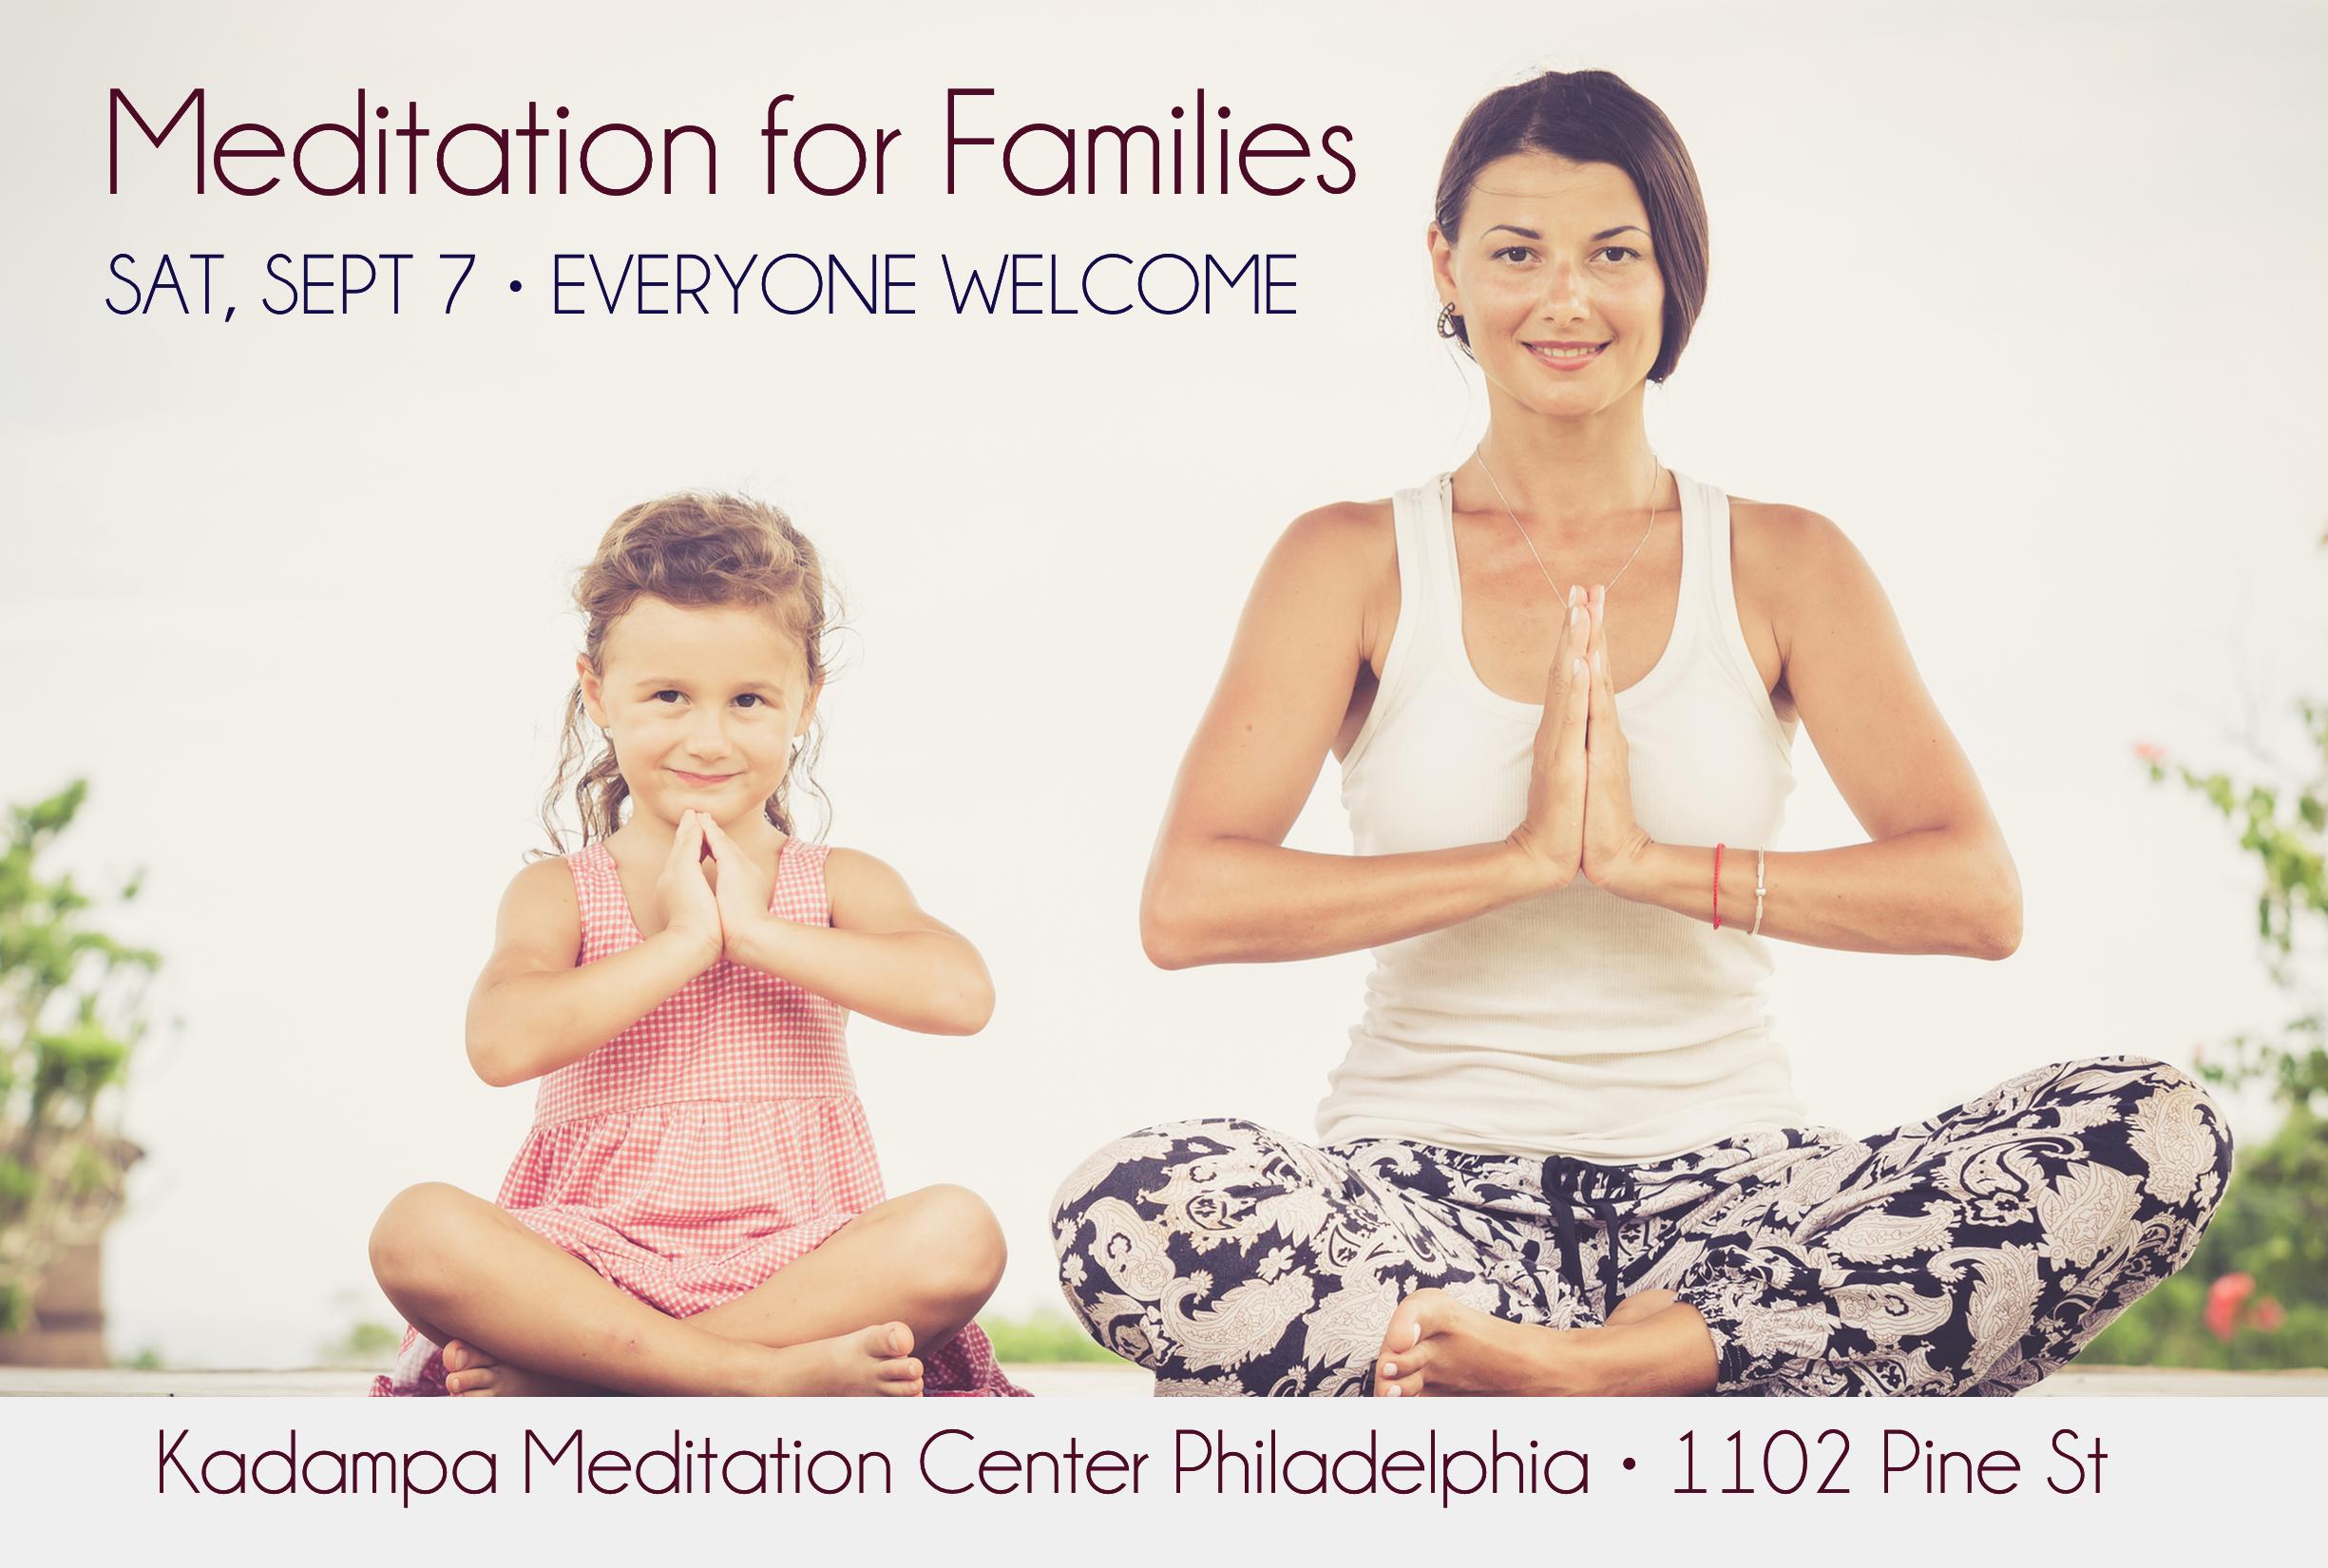 Meditation for Families v3 revised.jpg